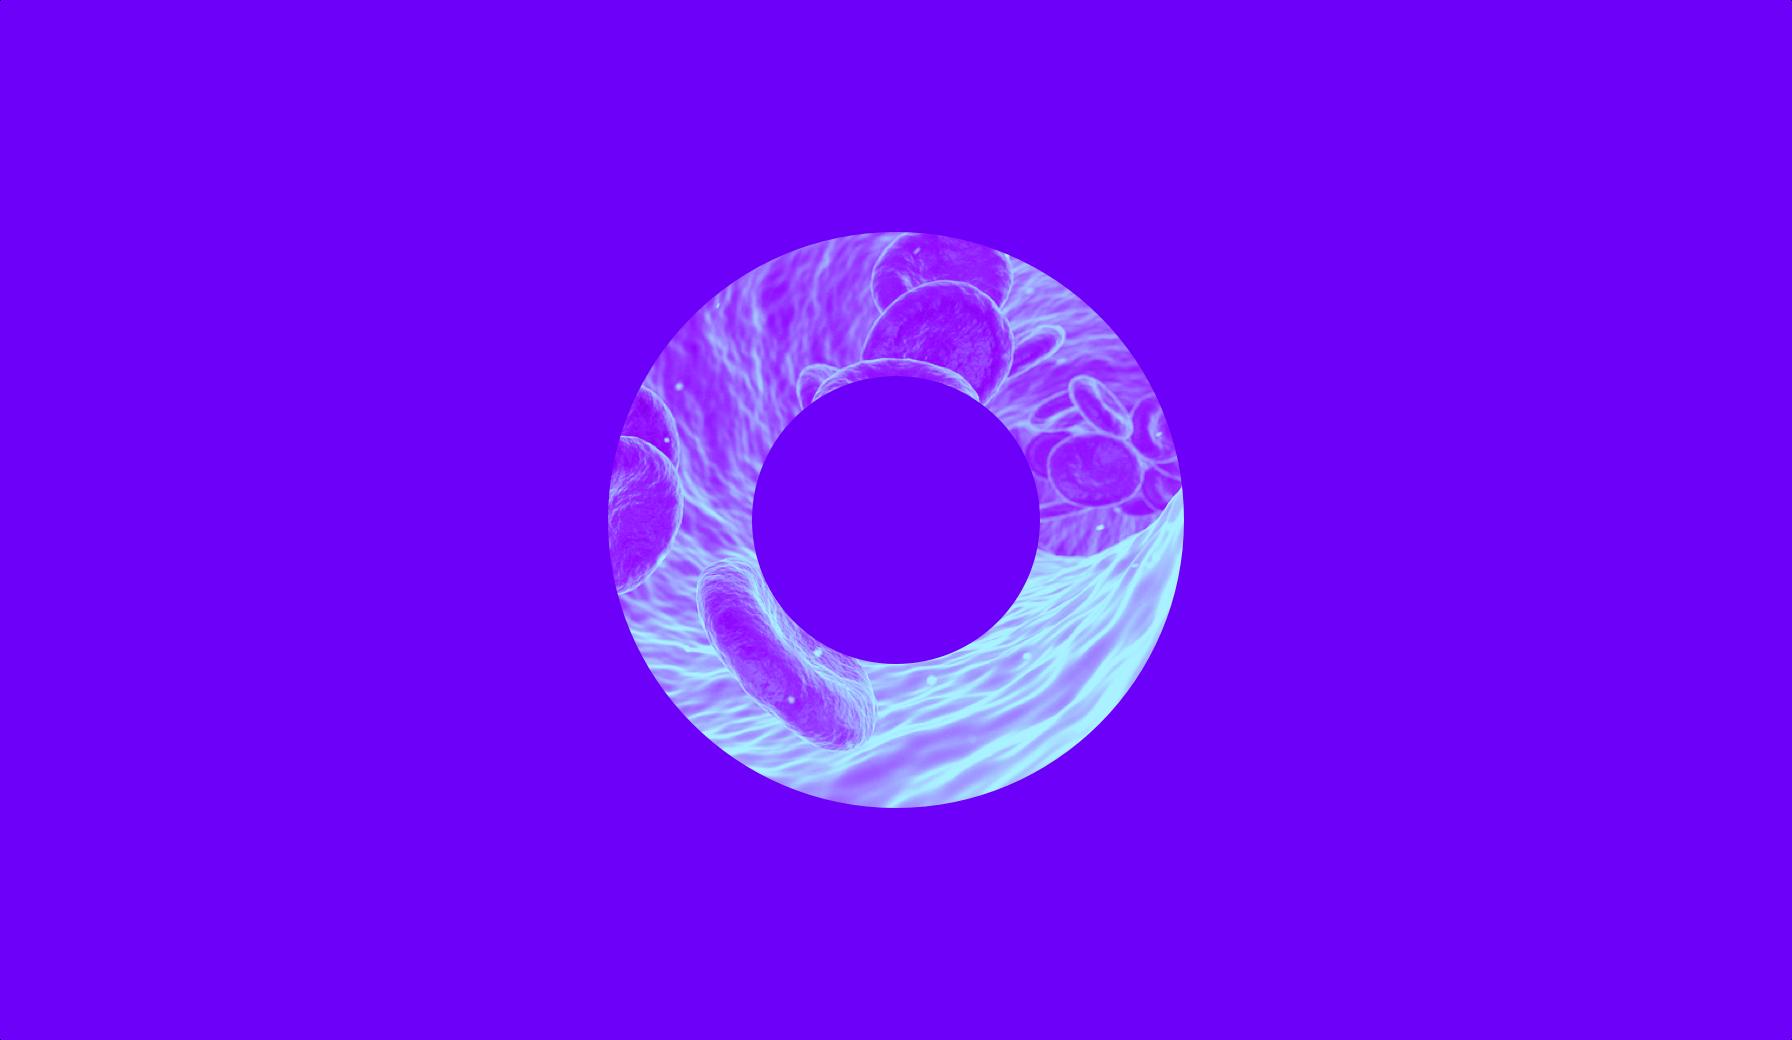 im_aura_896x520_intext-01